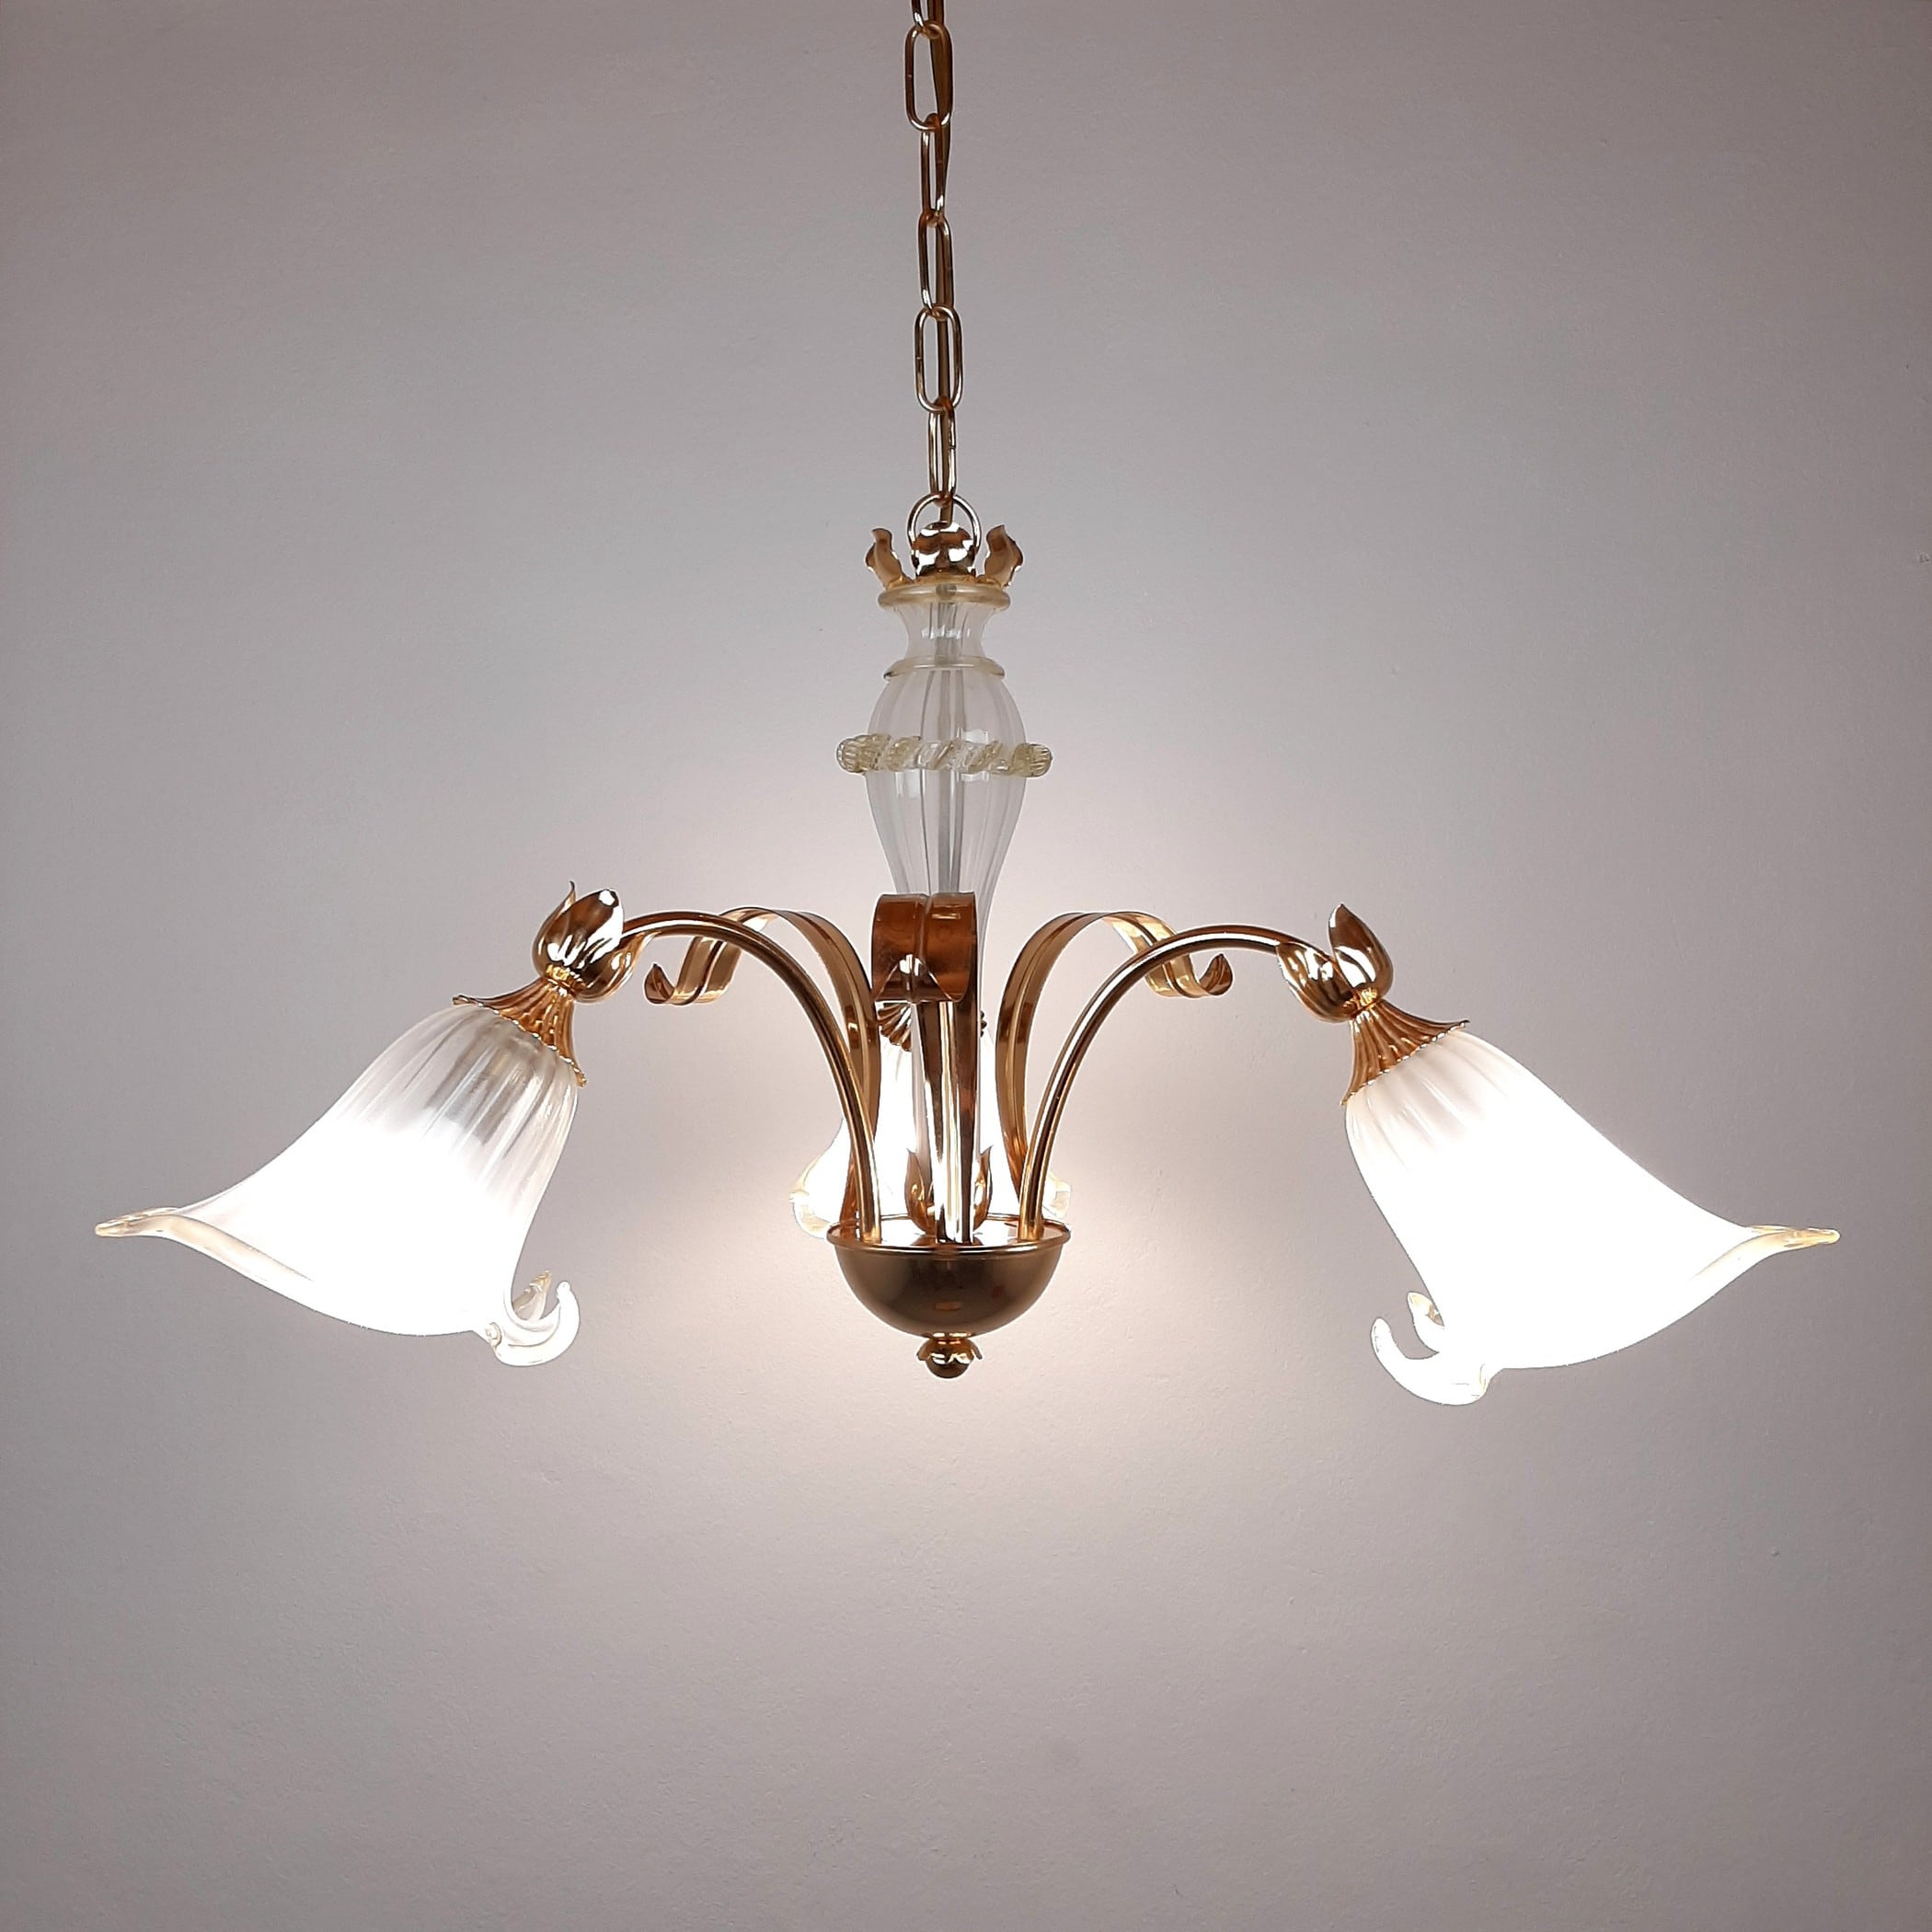 Vintage murano chandelier Lilies Italy 1980s Hollywood Regency style Italian lighting